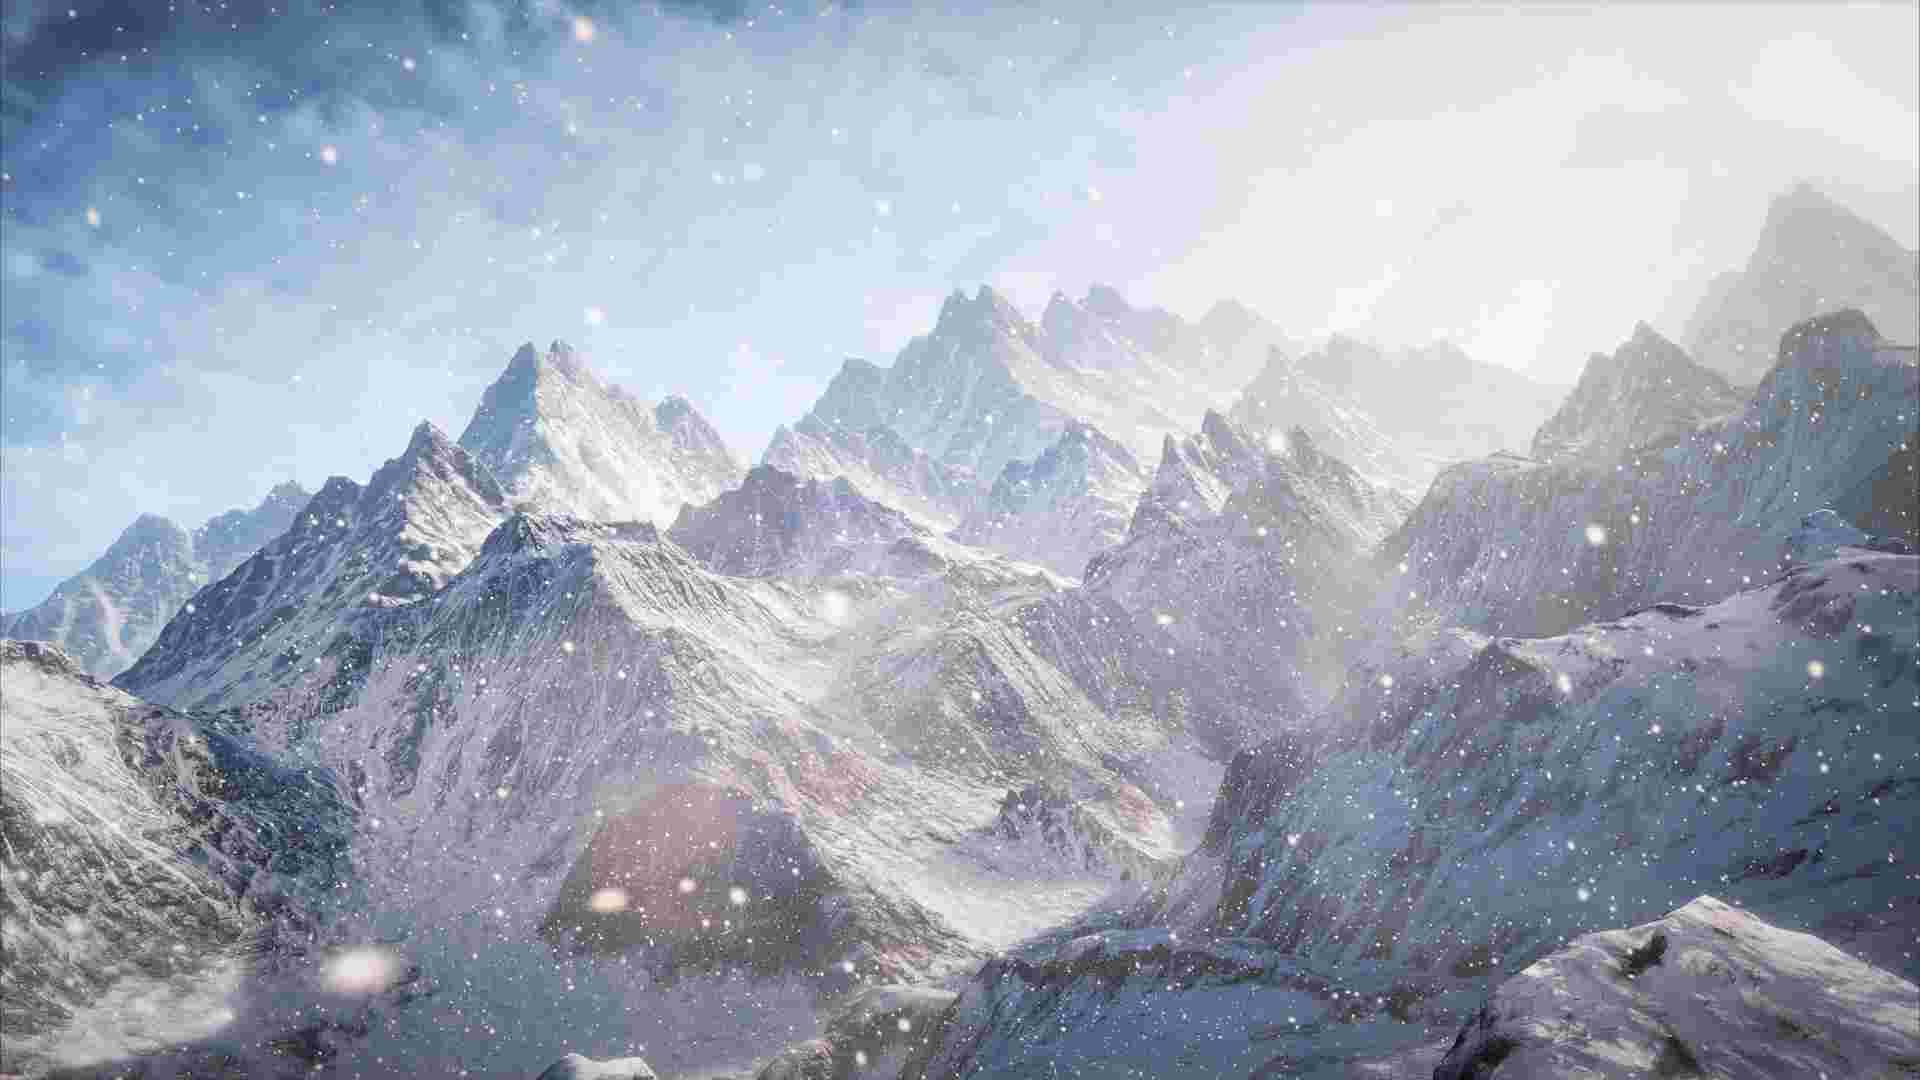 wpid-Unreal-Engine-4-Wallpaper-6